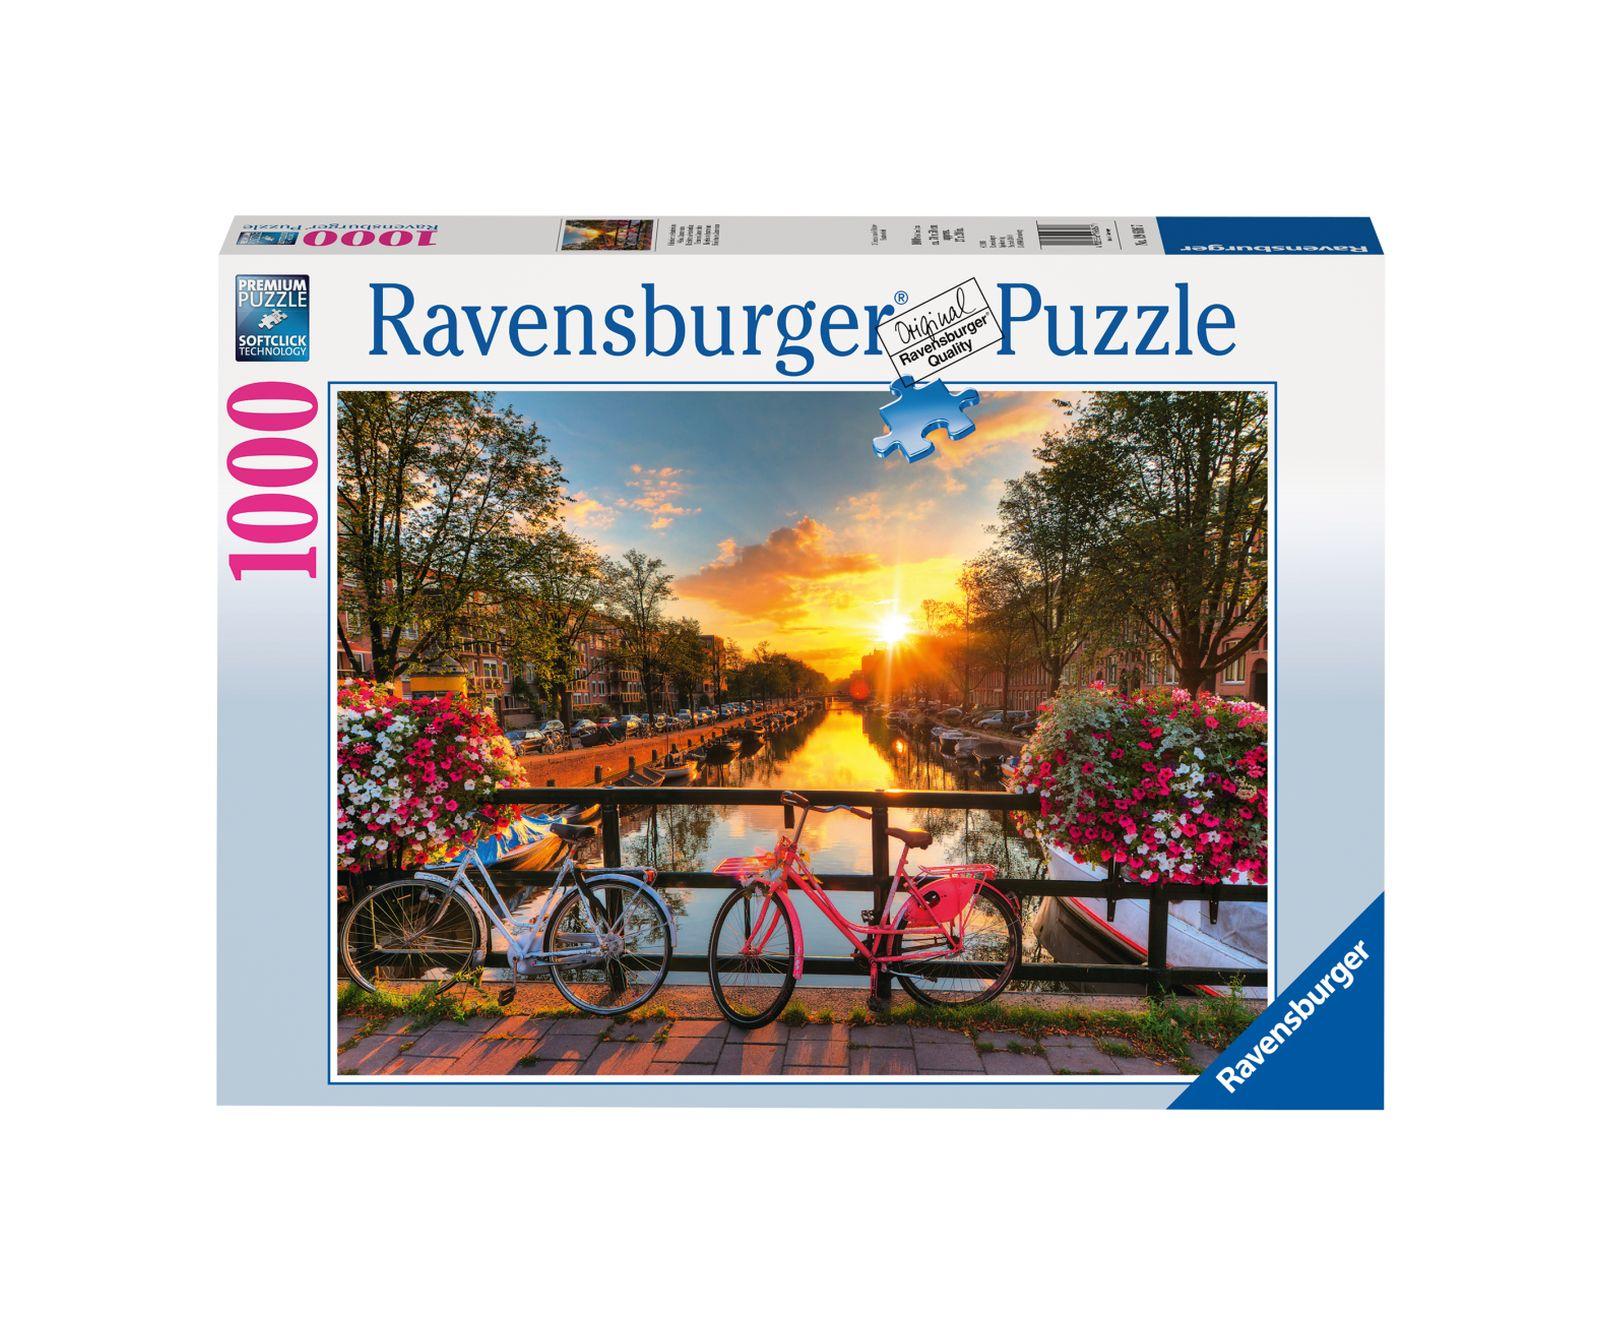 Ravensburger puzzle 1000 pezzi biciclette ad amsterdam - Ravensburger1